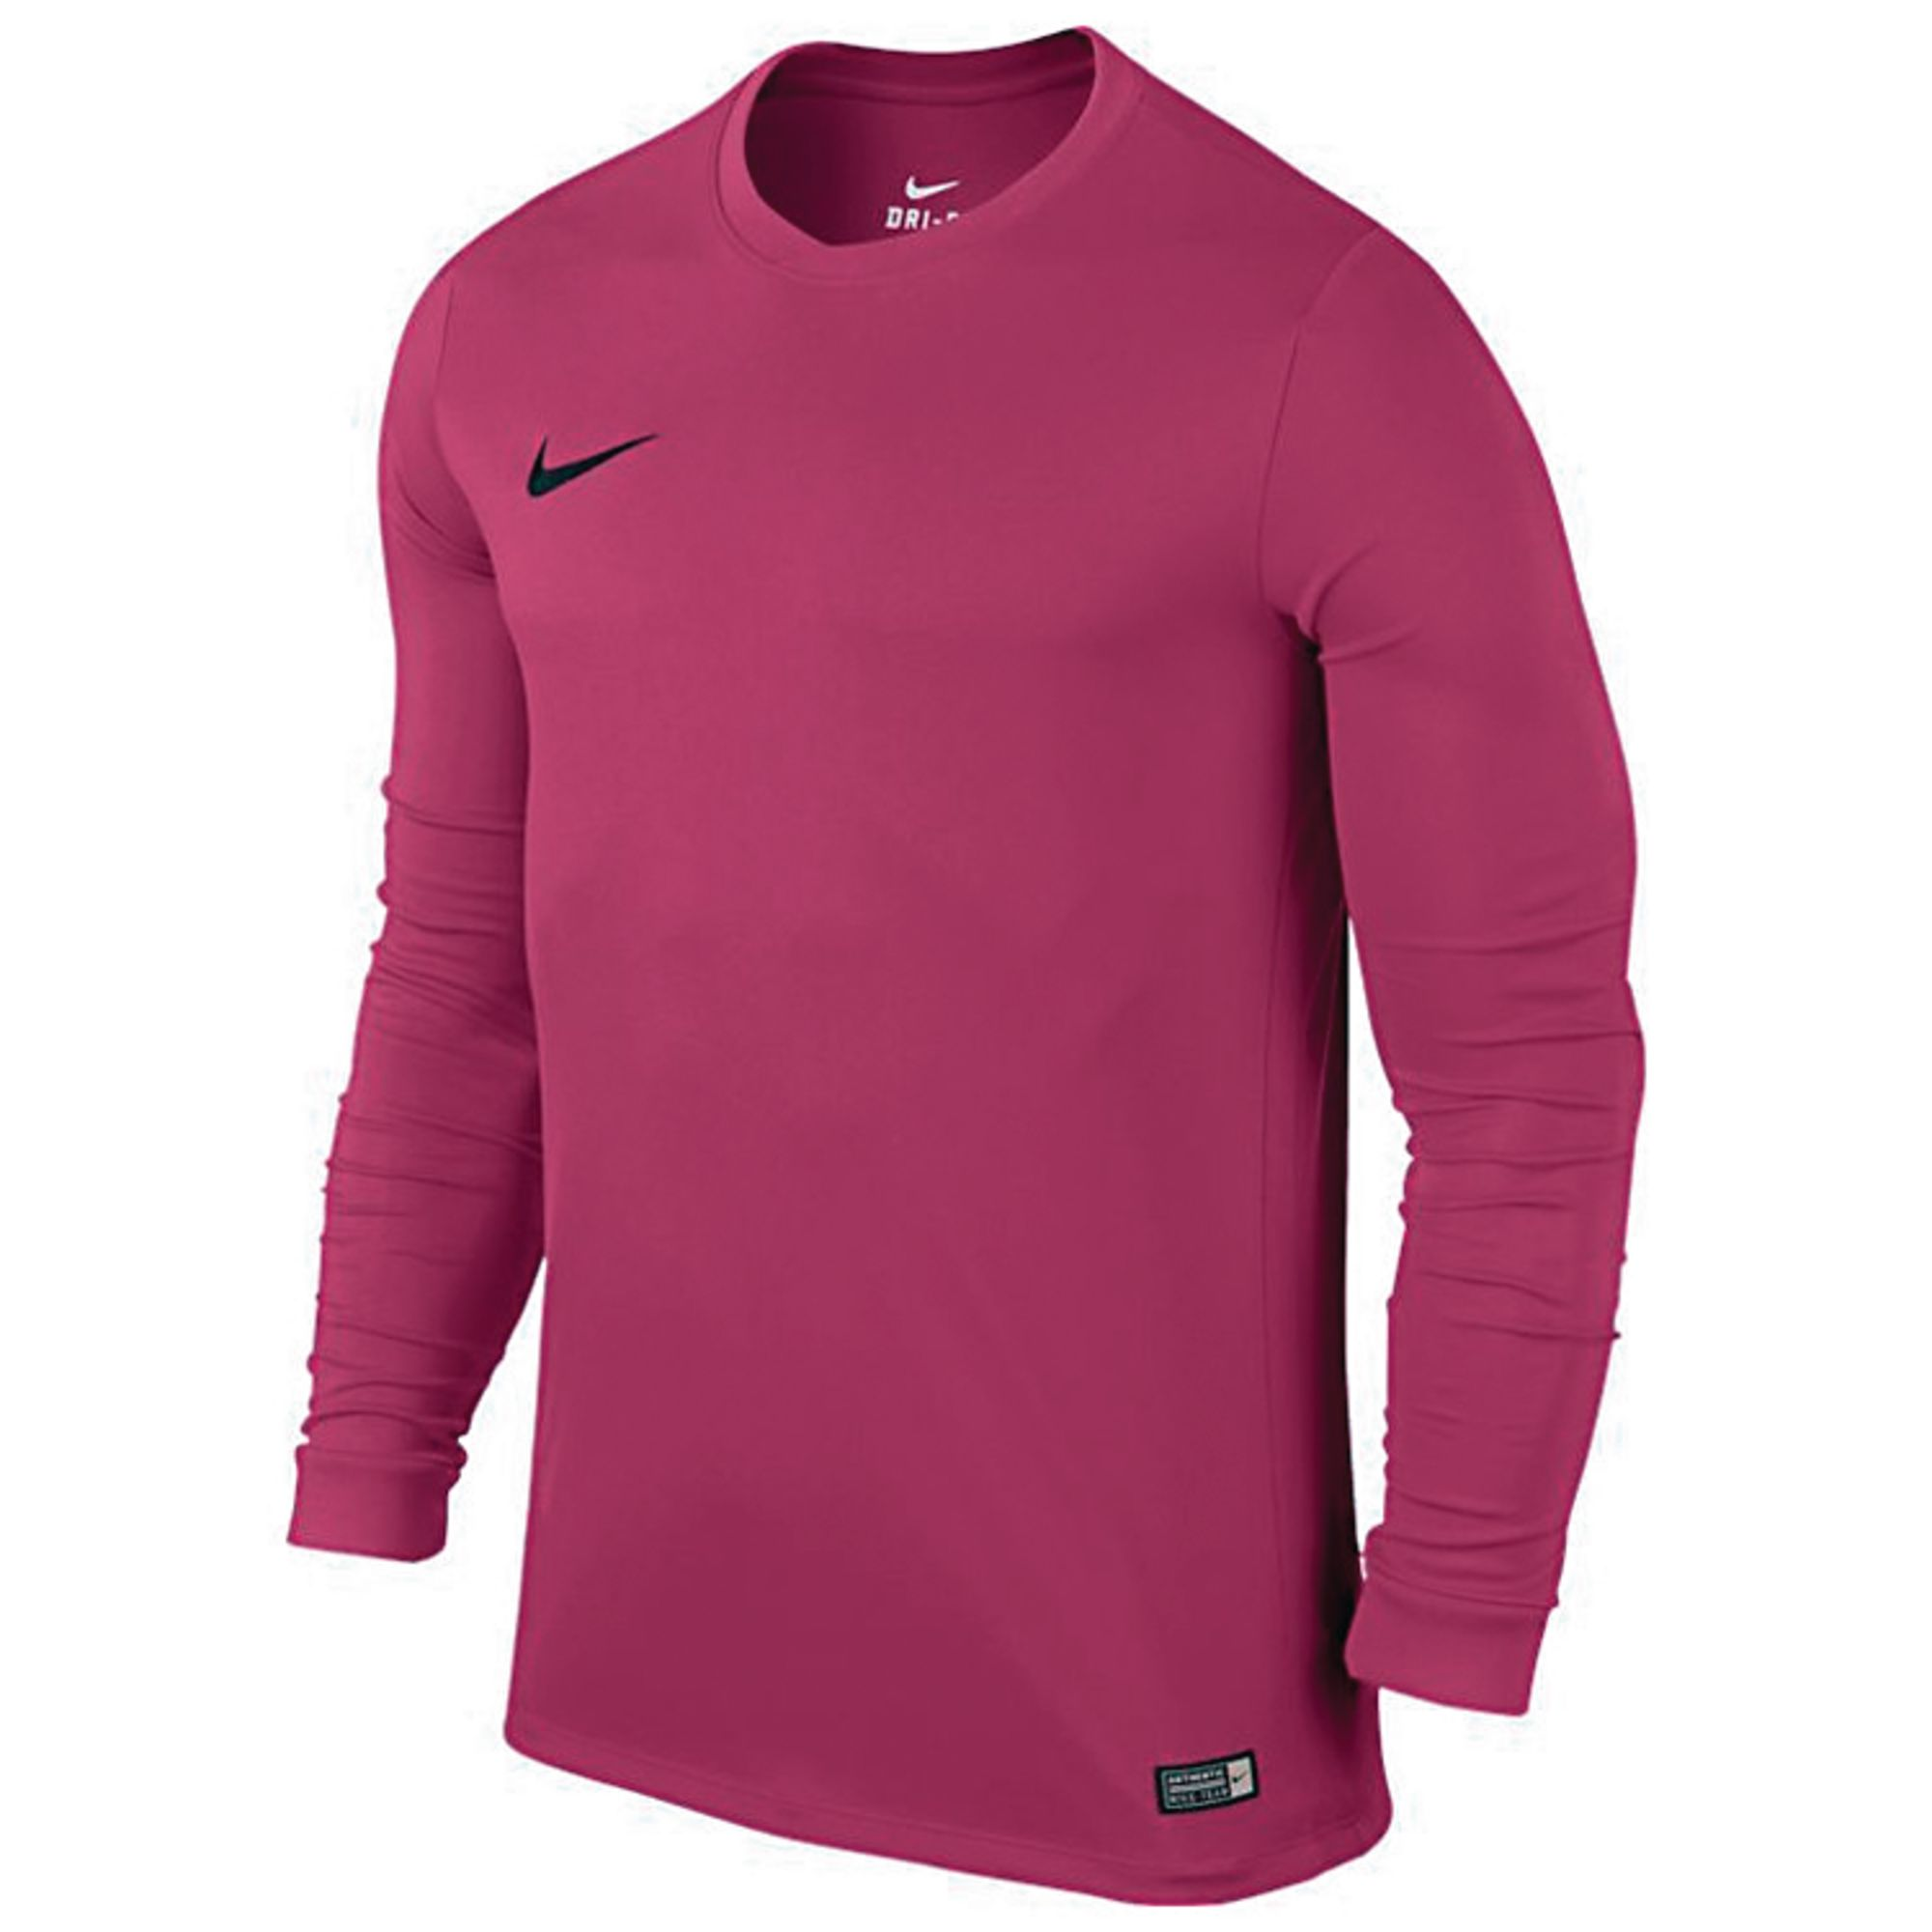 f5b10b9d Nike Park, 30-32in - Pink (Long Sleeve) | Findel International